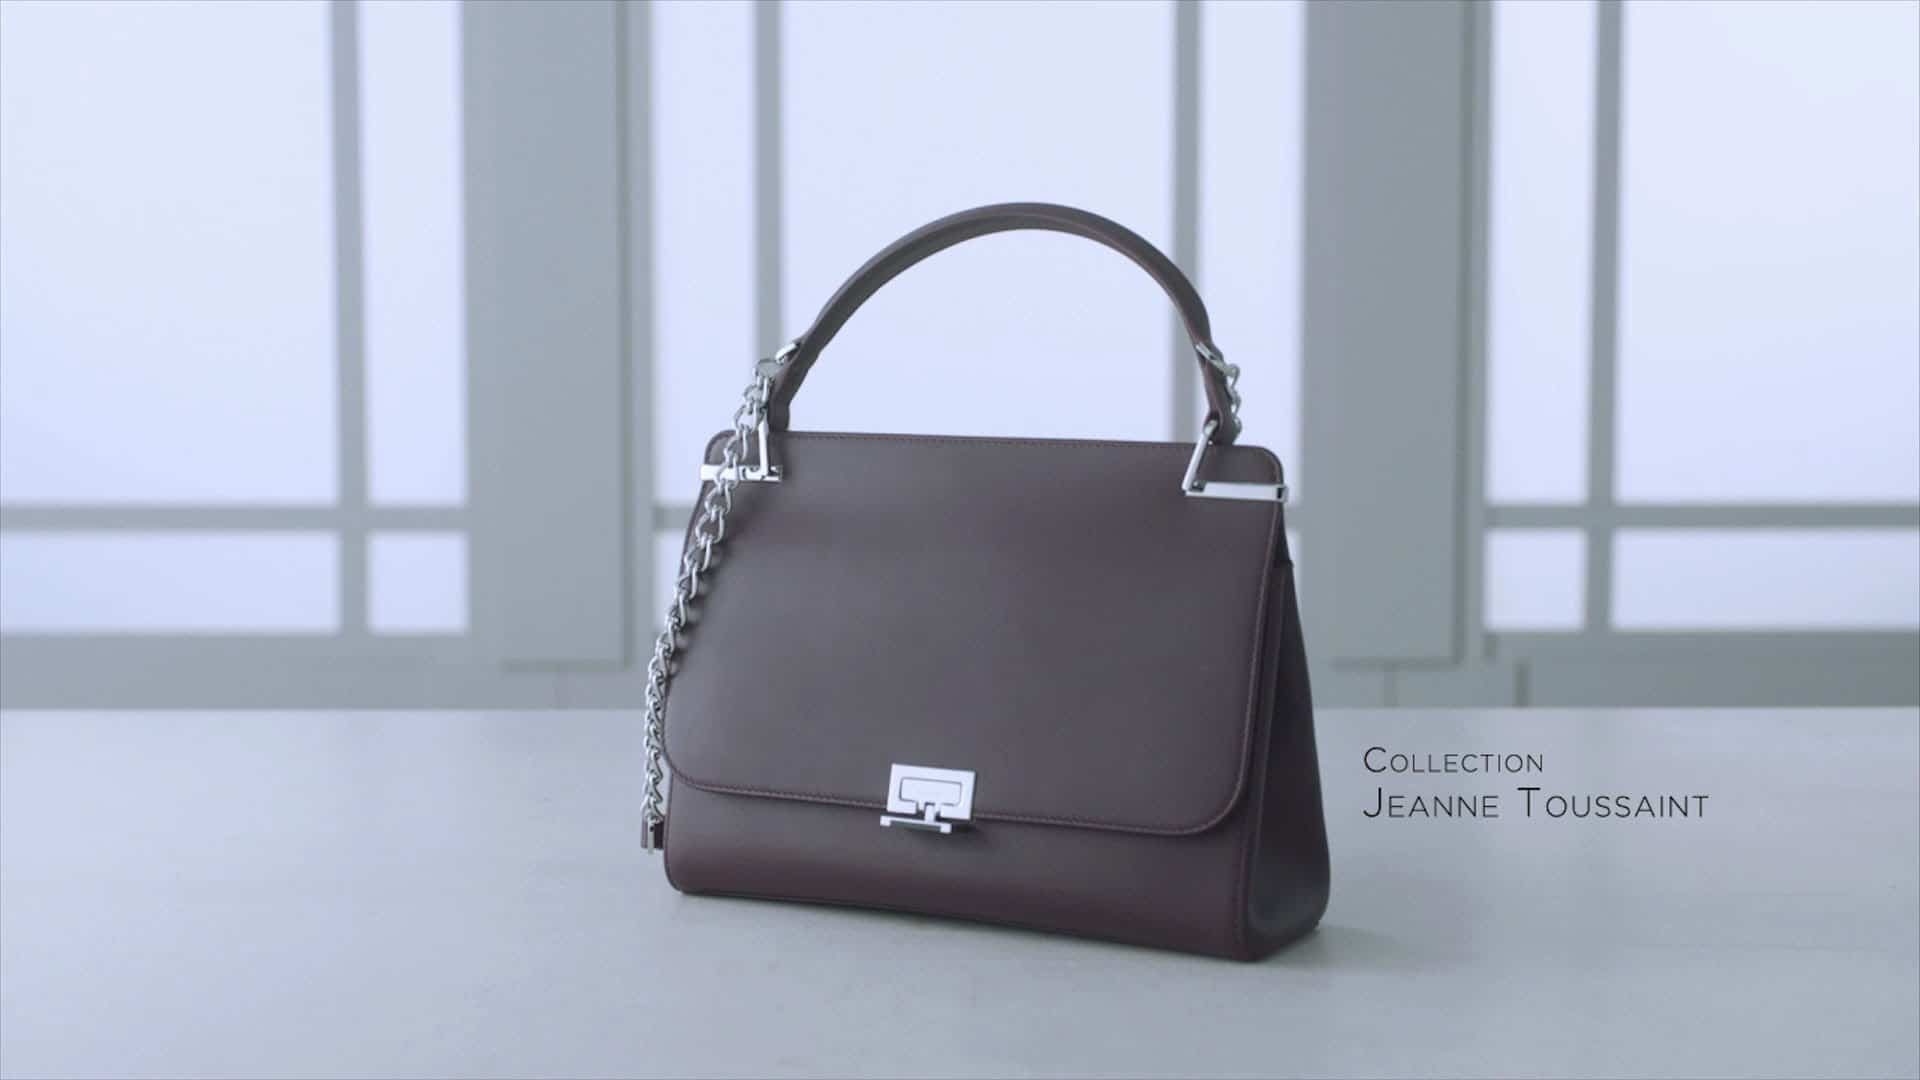 cartier-jeanne-toussaint-handbag